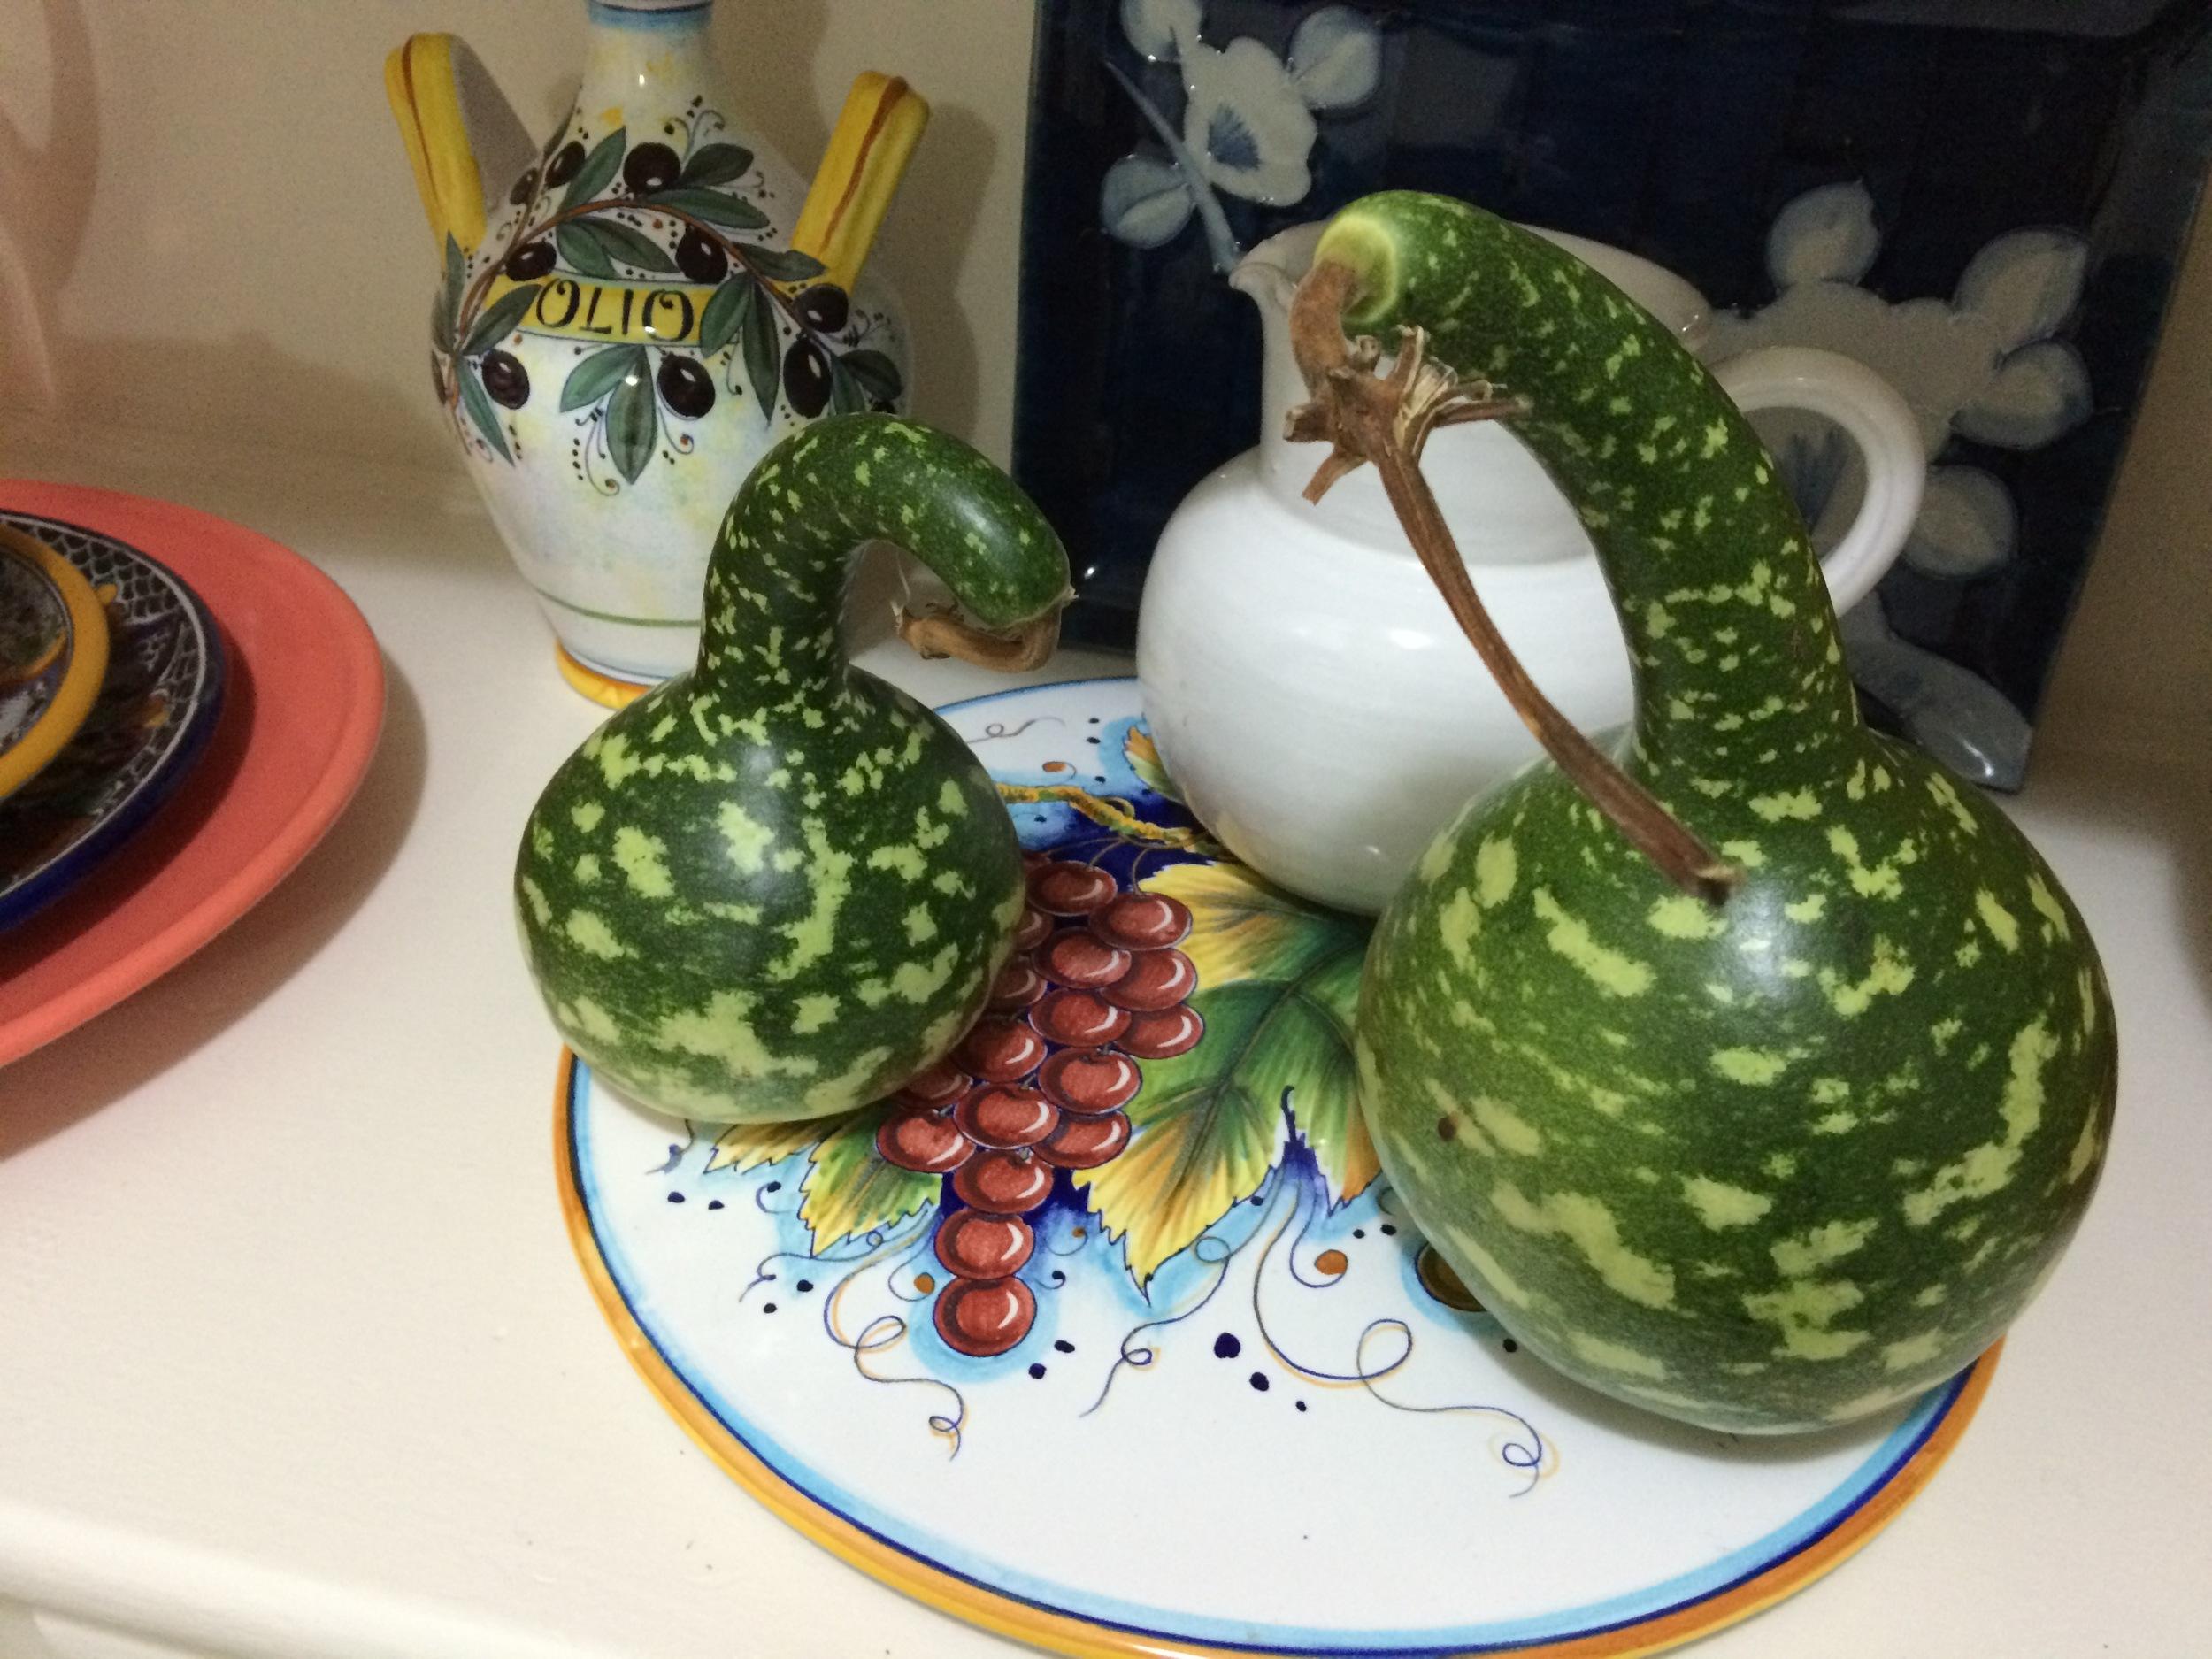 Kitchen+decor+with+green+gourds.jpeg